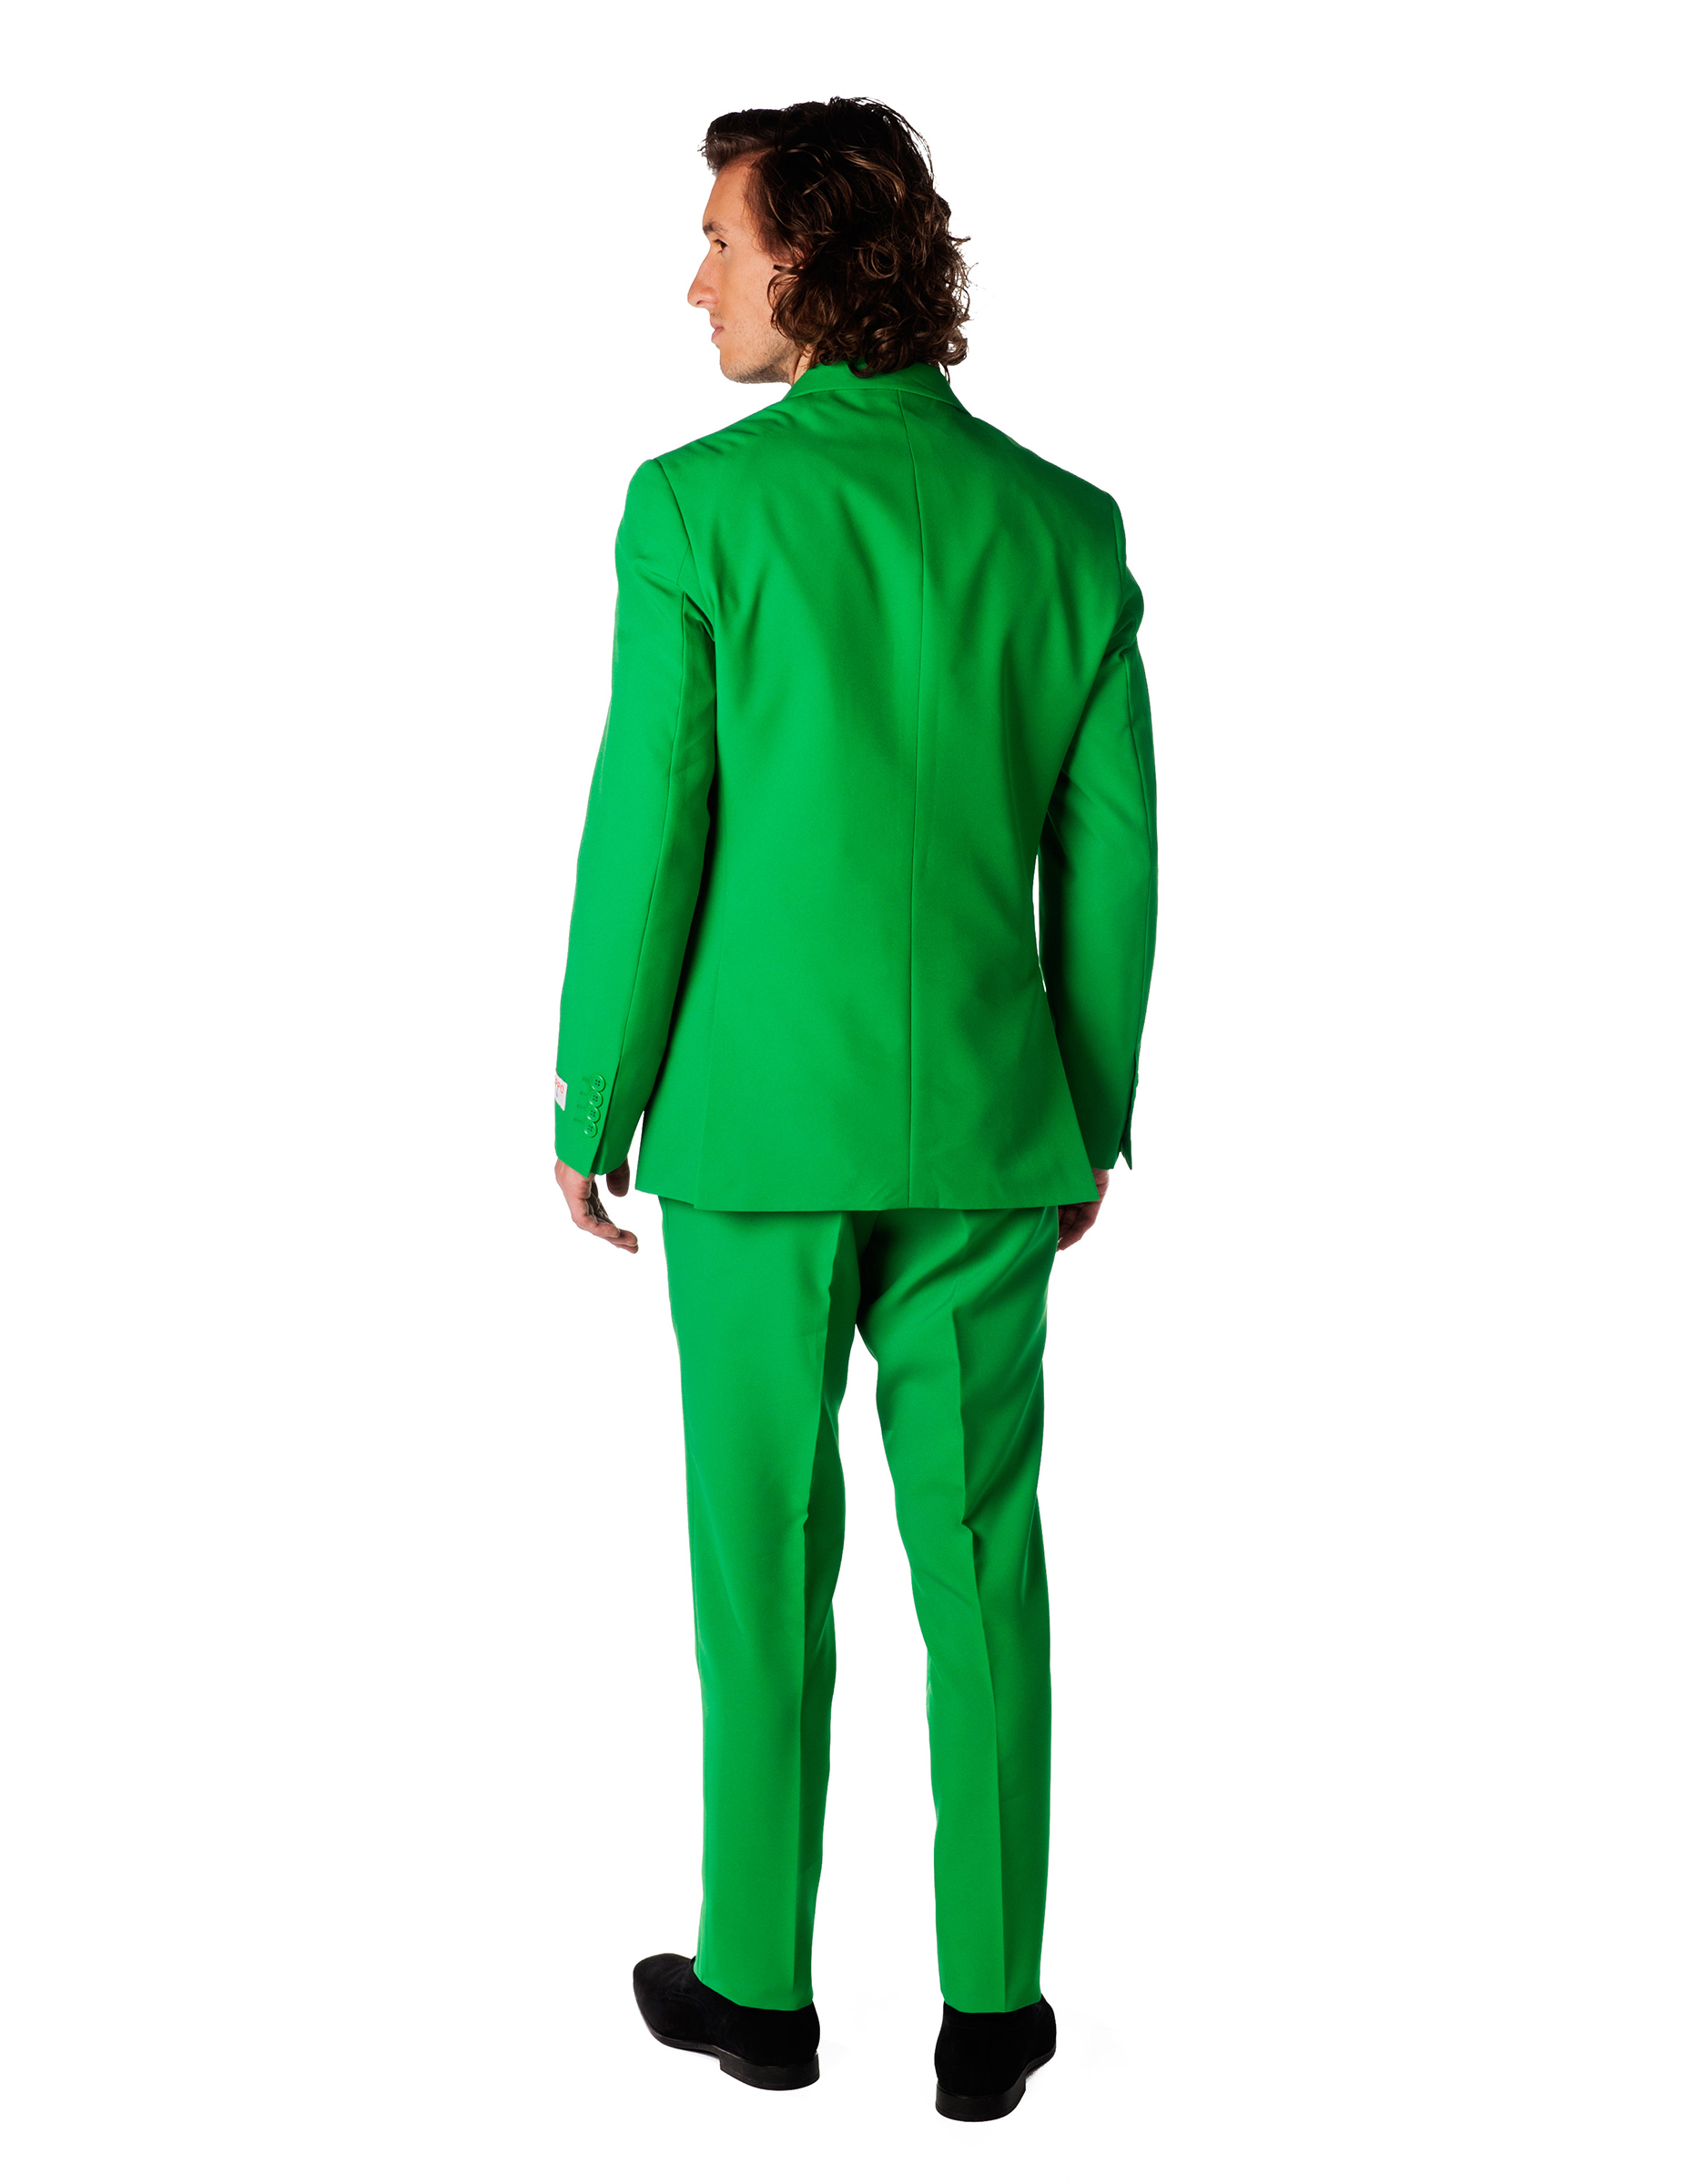 costume mr vert homme opposuits d coration anniversaire. Black Bedroom Furniture Sets. Home Design Ideas